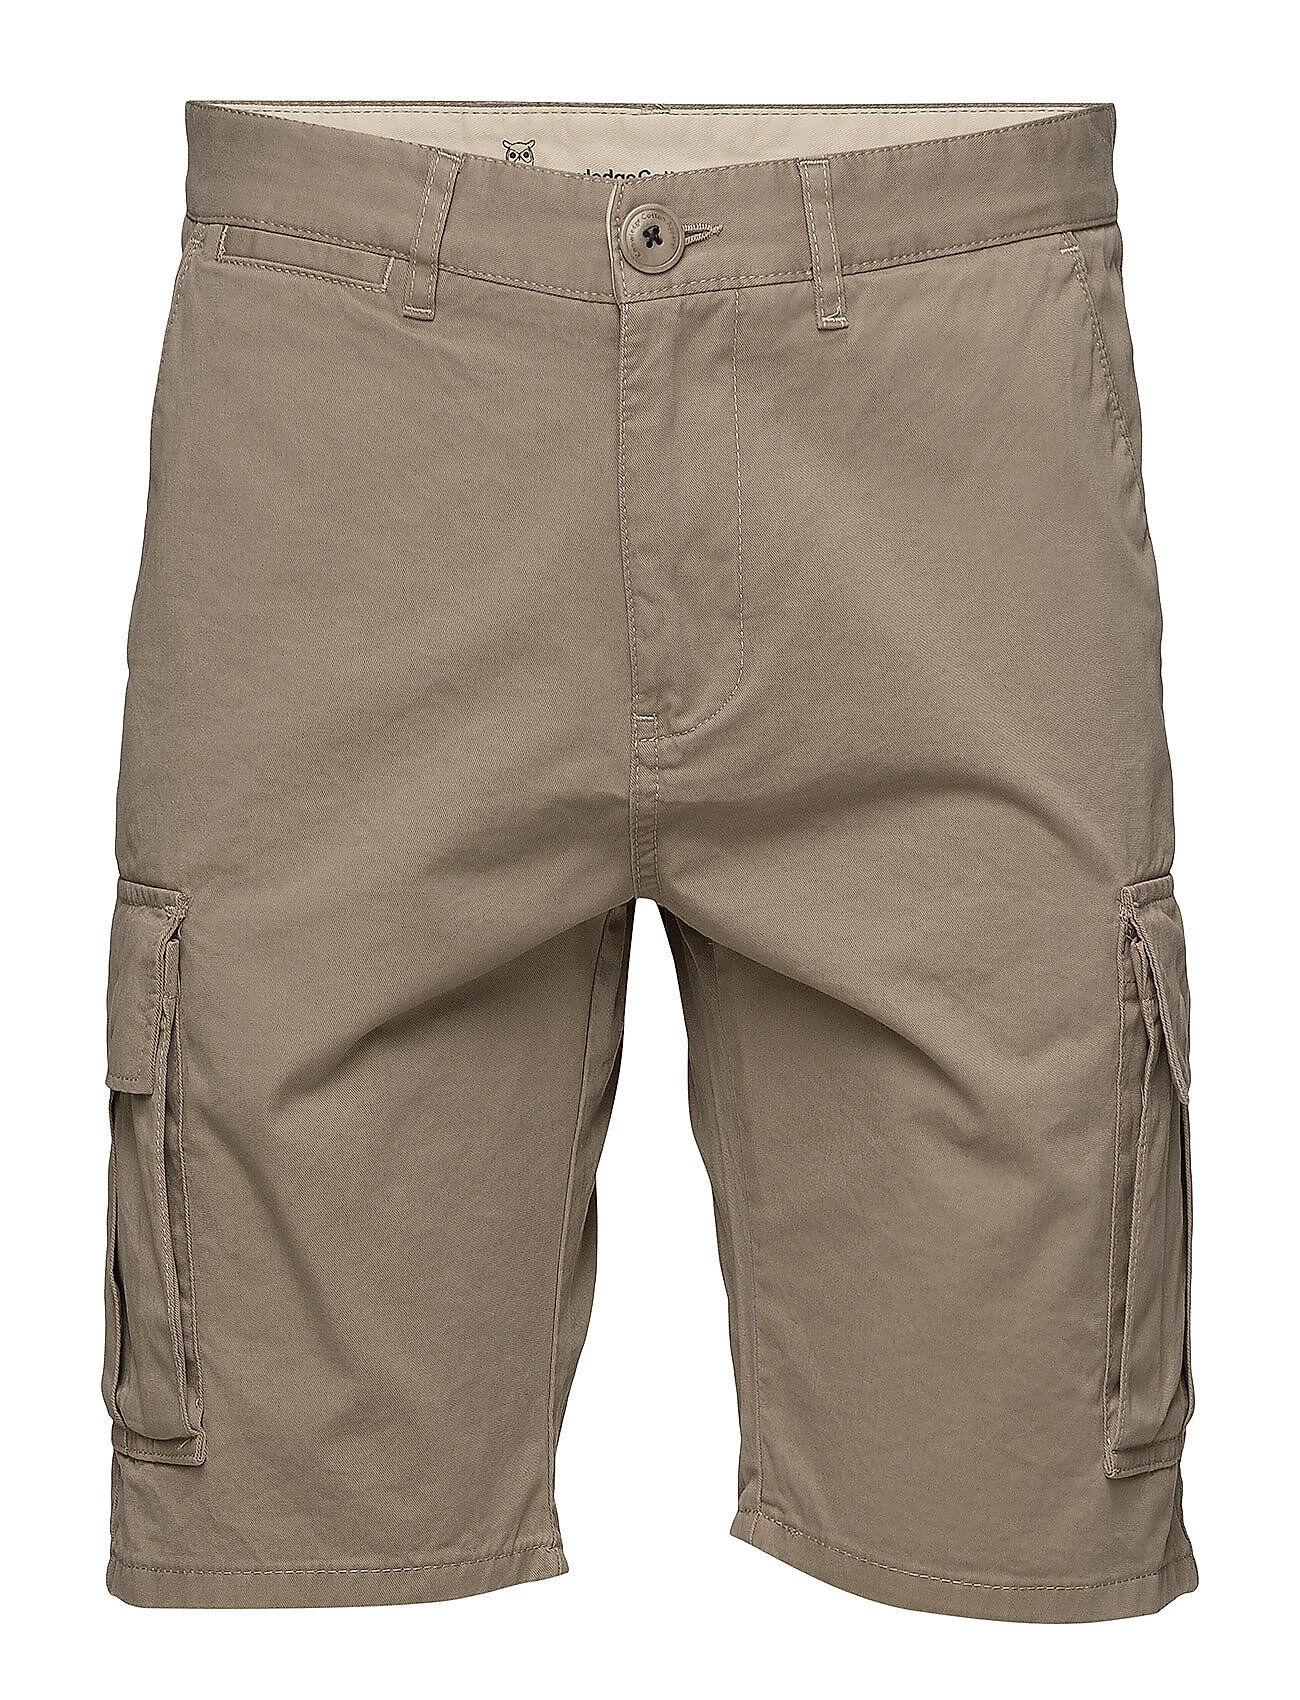 Knowledge Cotton Apparel Cargo Shorts - Gots/Vegan